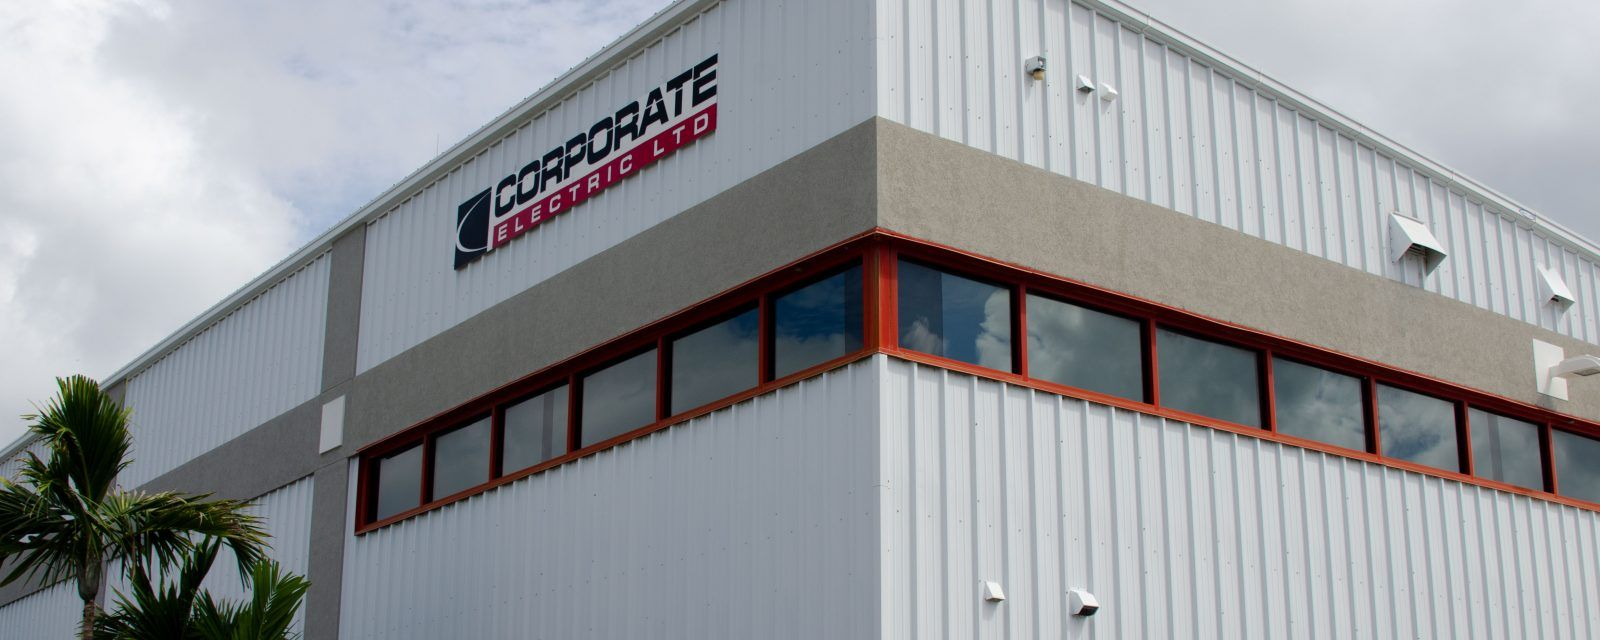 Corporate Electric, Ltd.